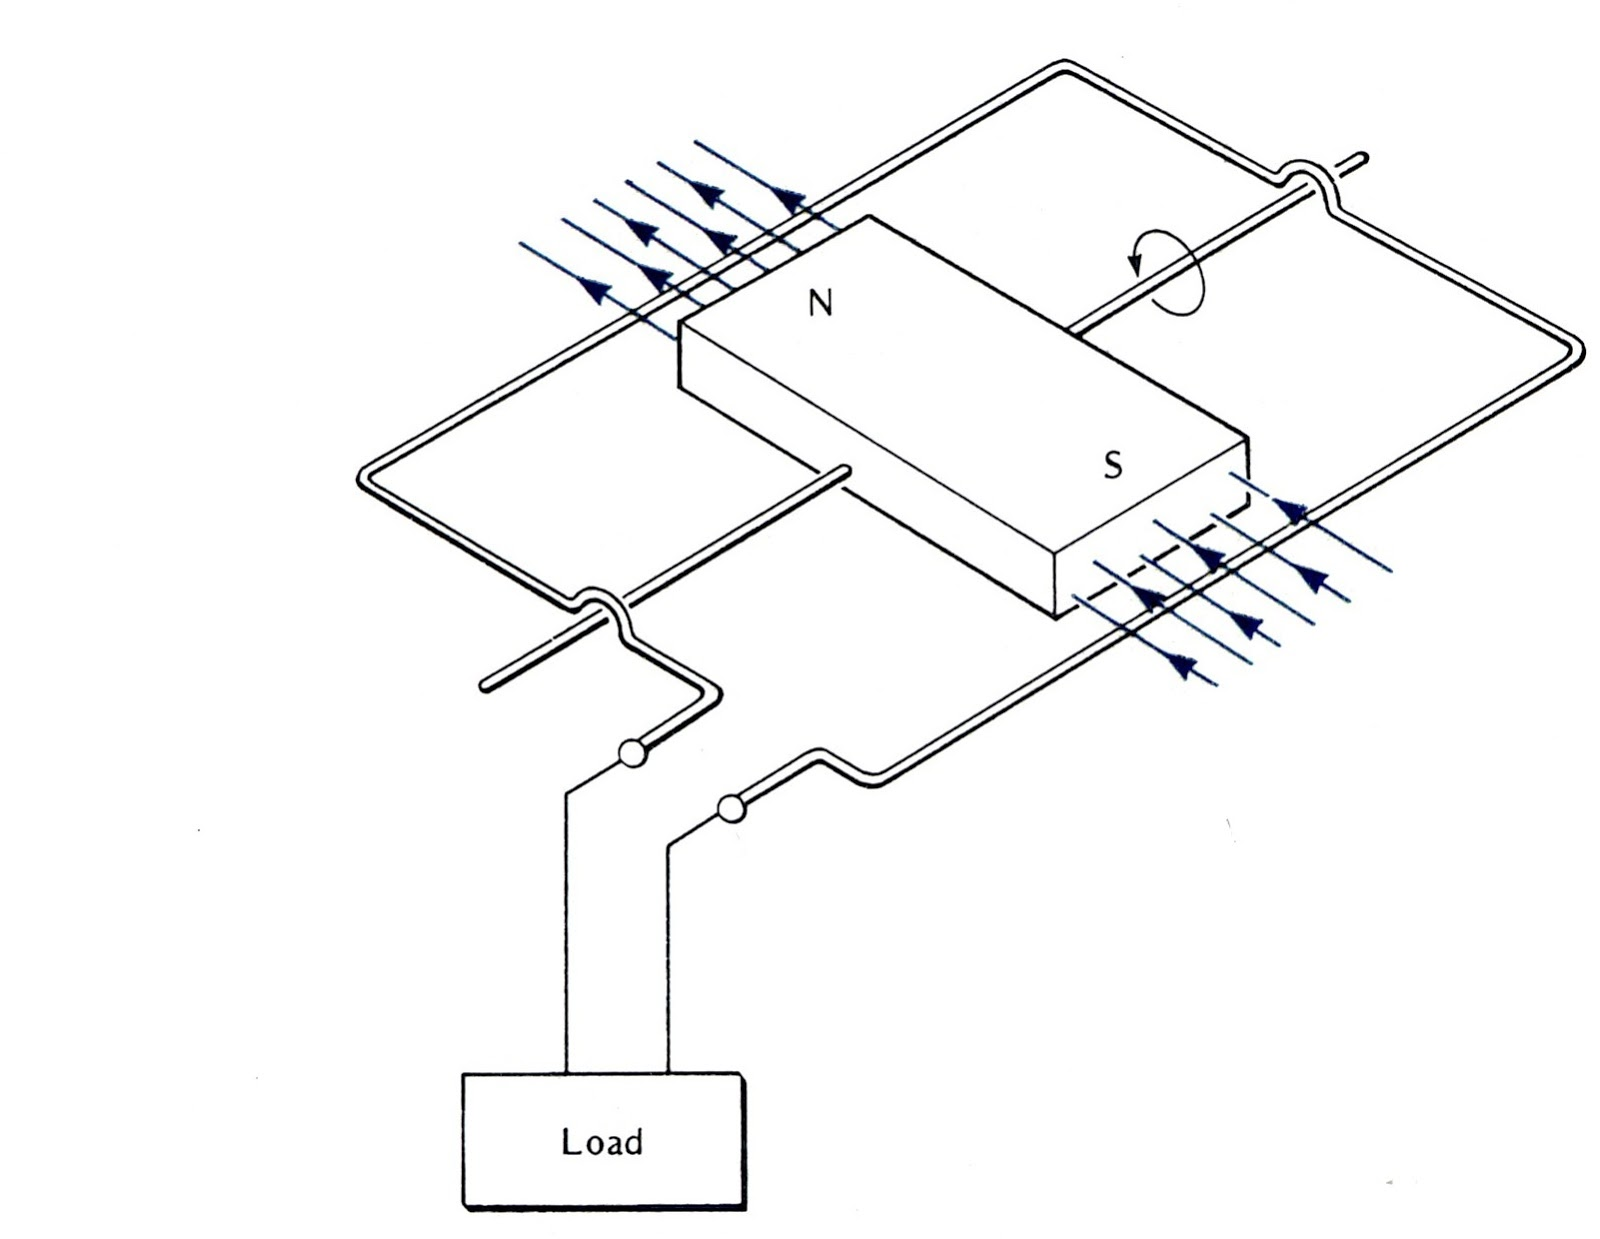 Wiring diagram book home wiring diagram book home image wiring wiring diagram book file wiring image wiring wiring diagram book file 0140 wiring discover your wiring swarovskicordoba Choice Image